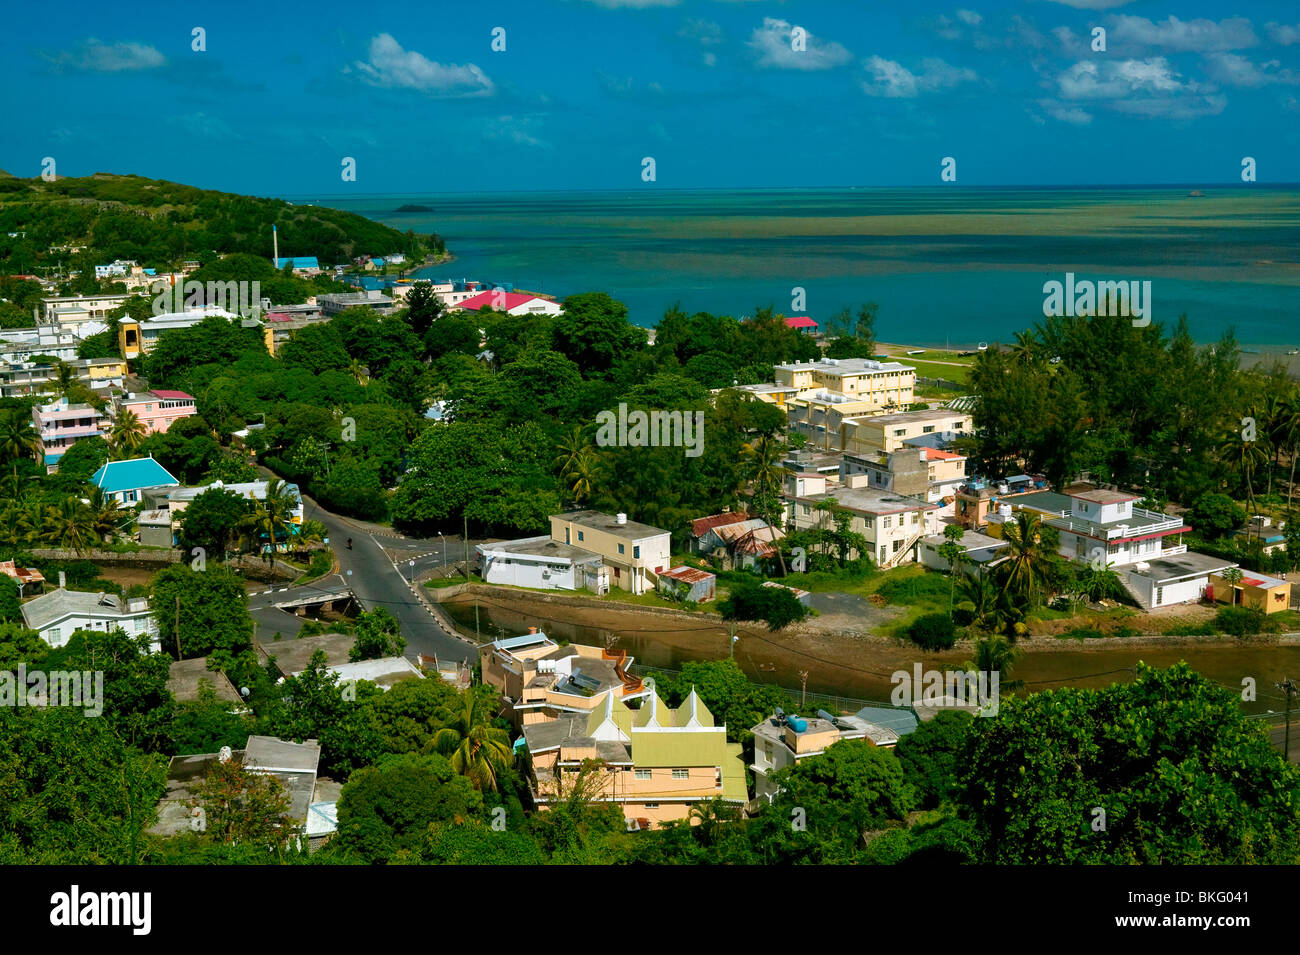 PORT MATHURIN, RODRIGUES ISLAND, MAURITIUS REPUBLIC Stock Photo